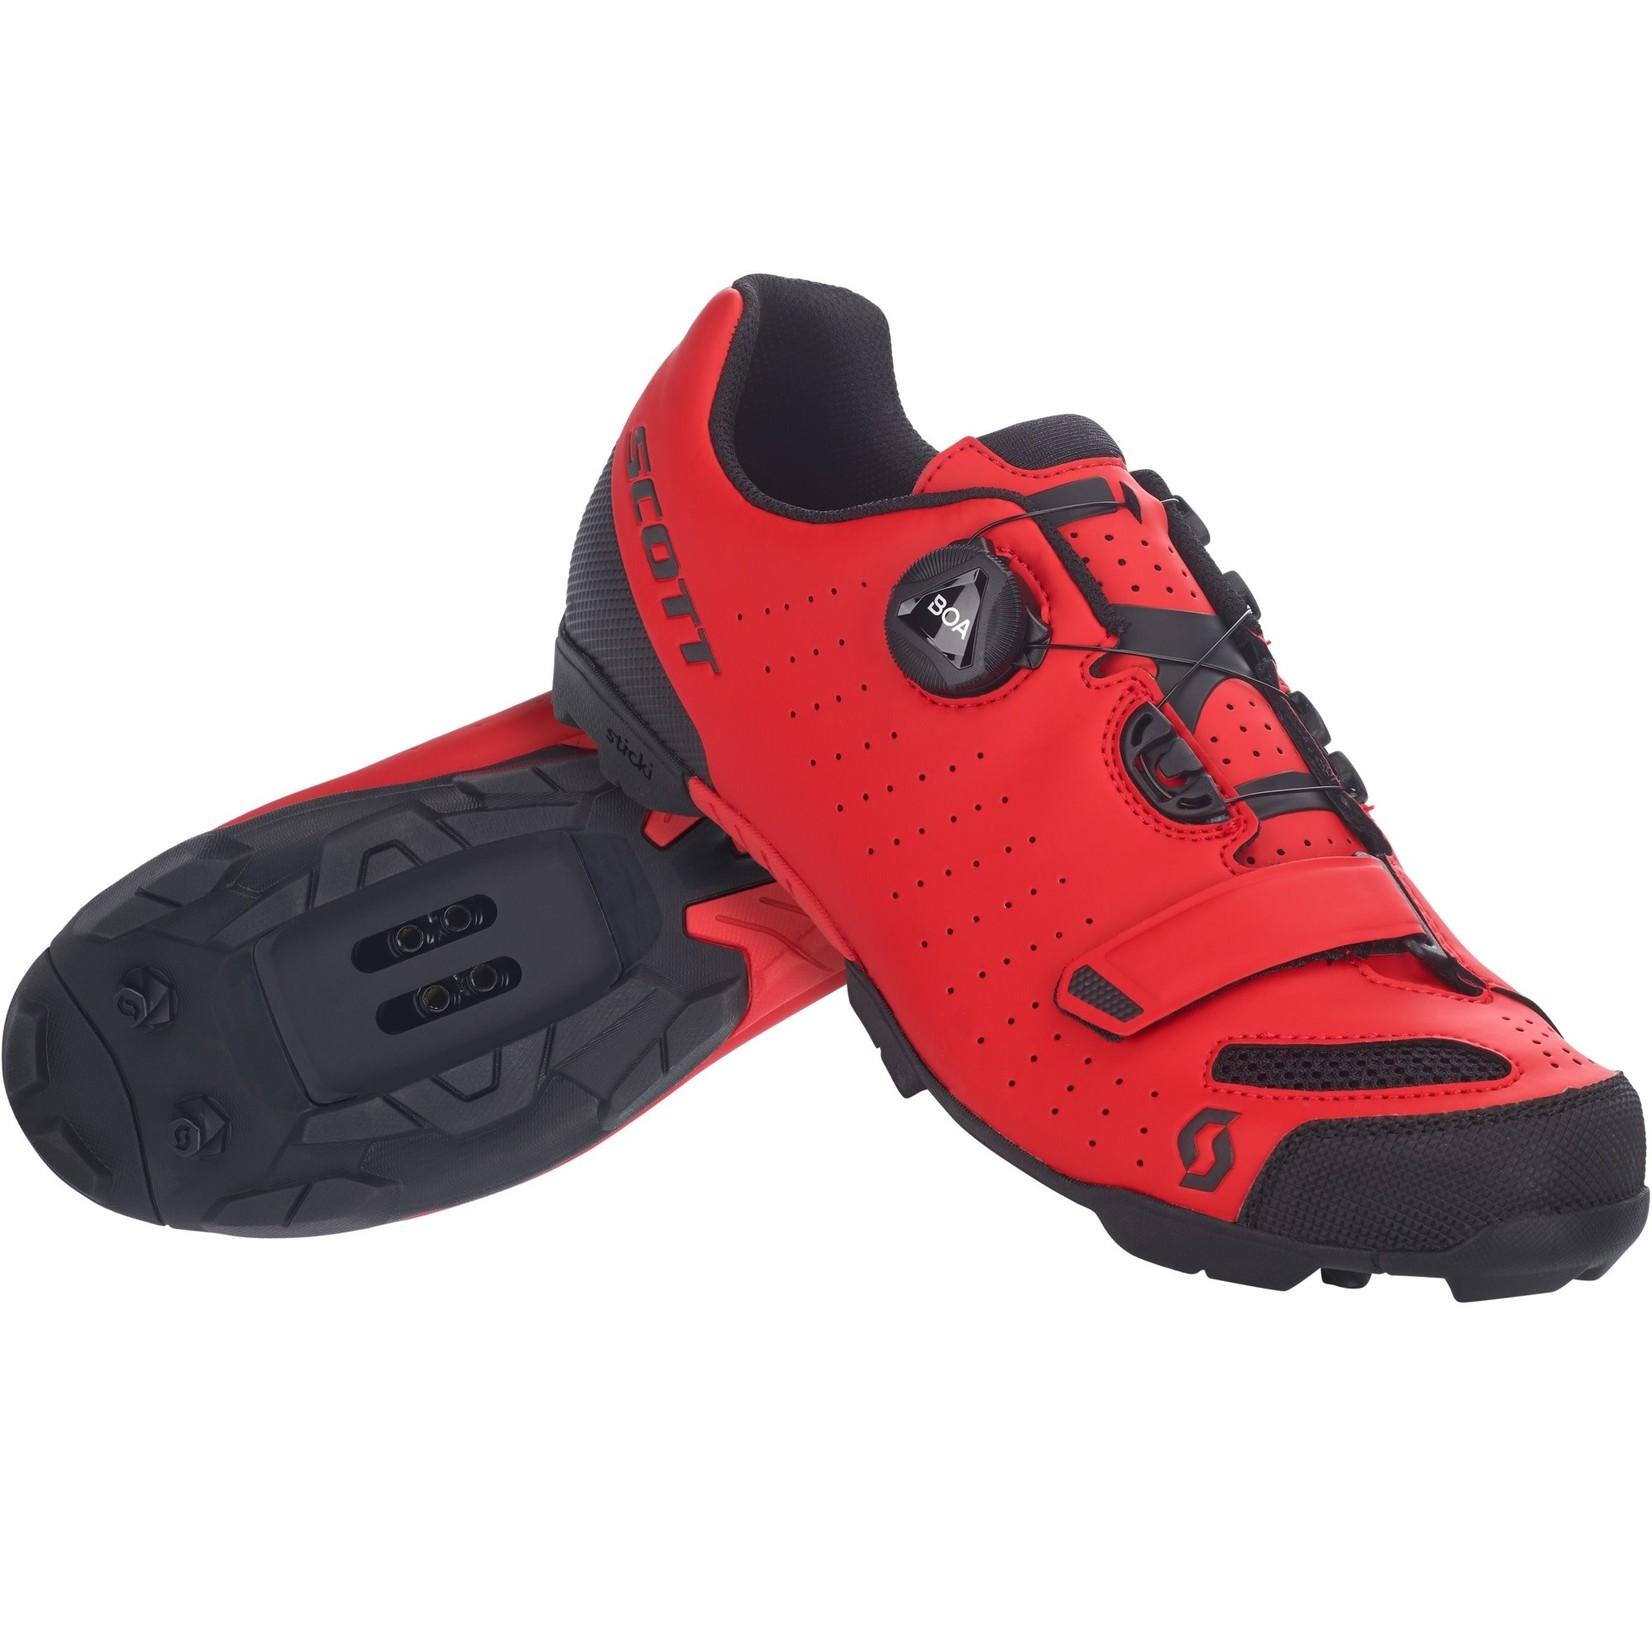 Scott SCO Shoe Mtb Comp Boa red/black 42.0 EU